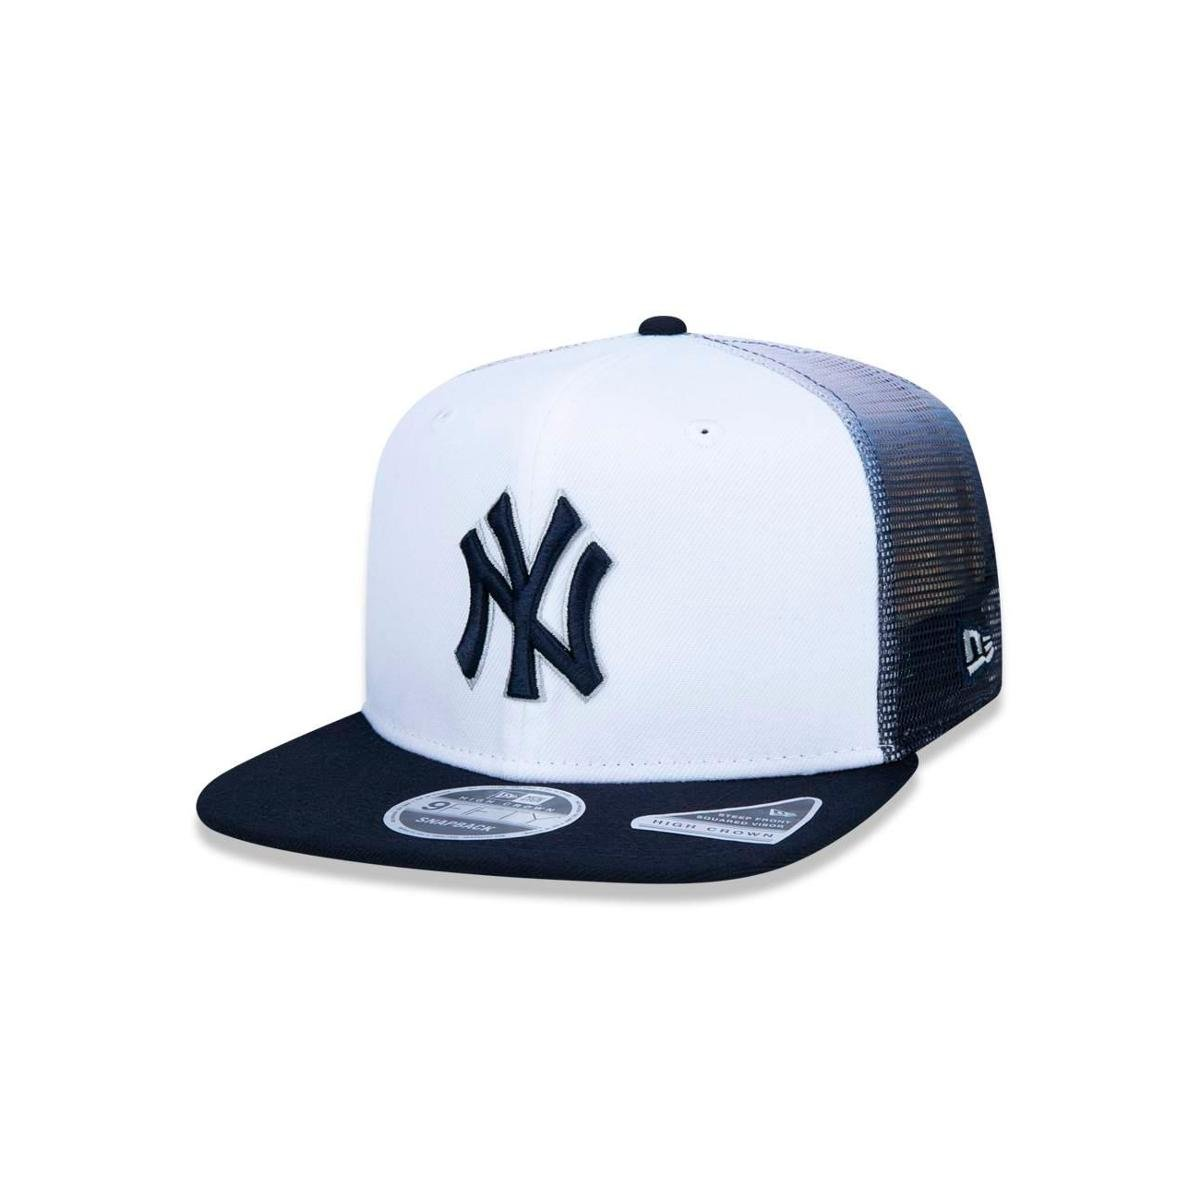 Boné 920 New York Yankees MLB Aba Curva New Era - Compre Agora ... 4800f4b379d